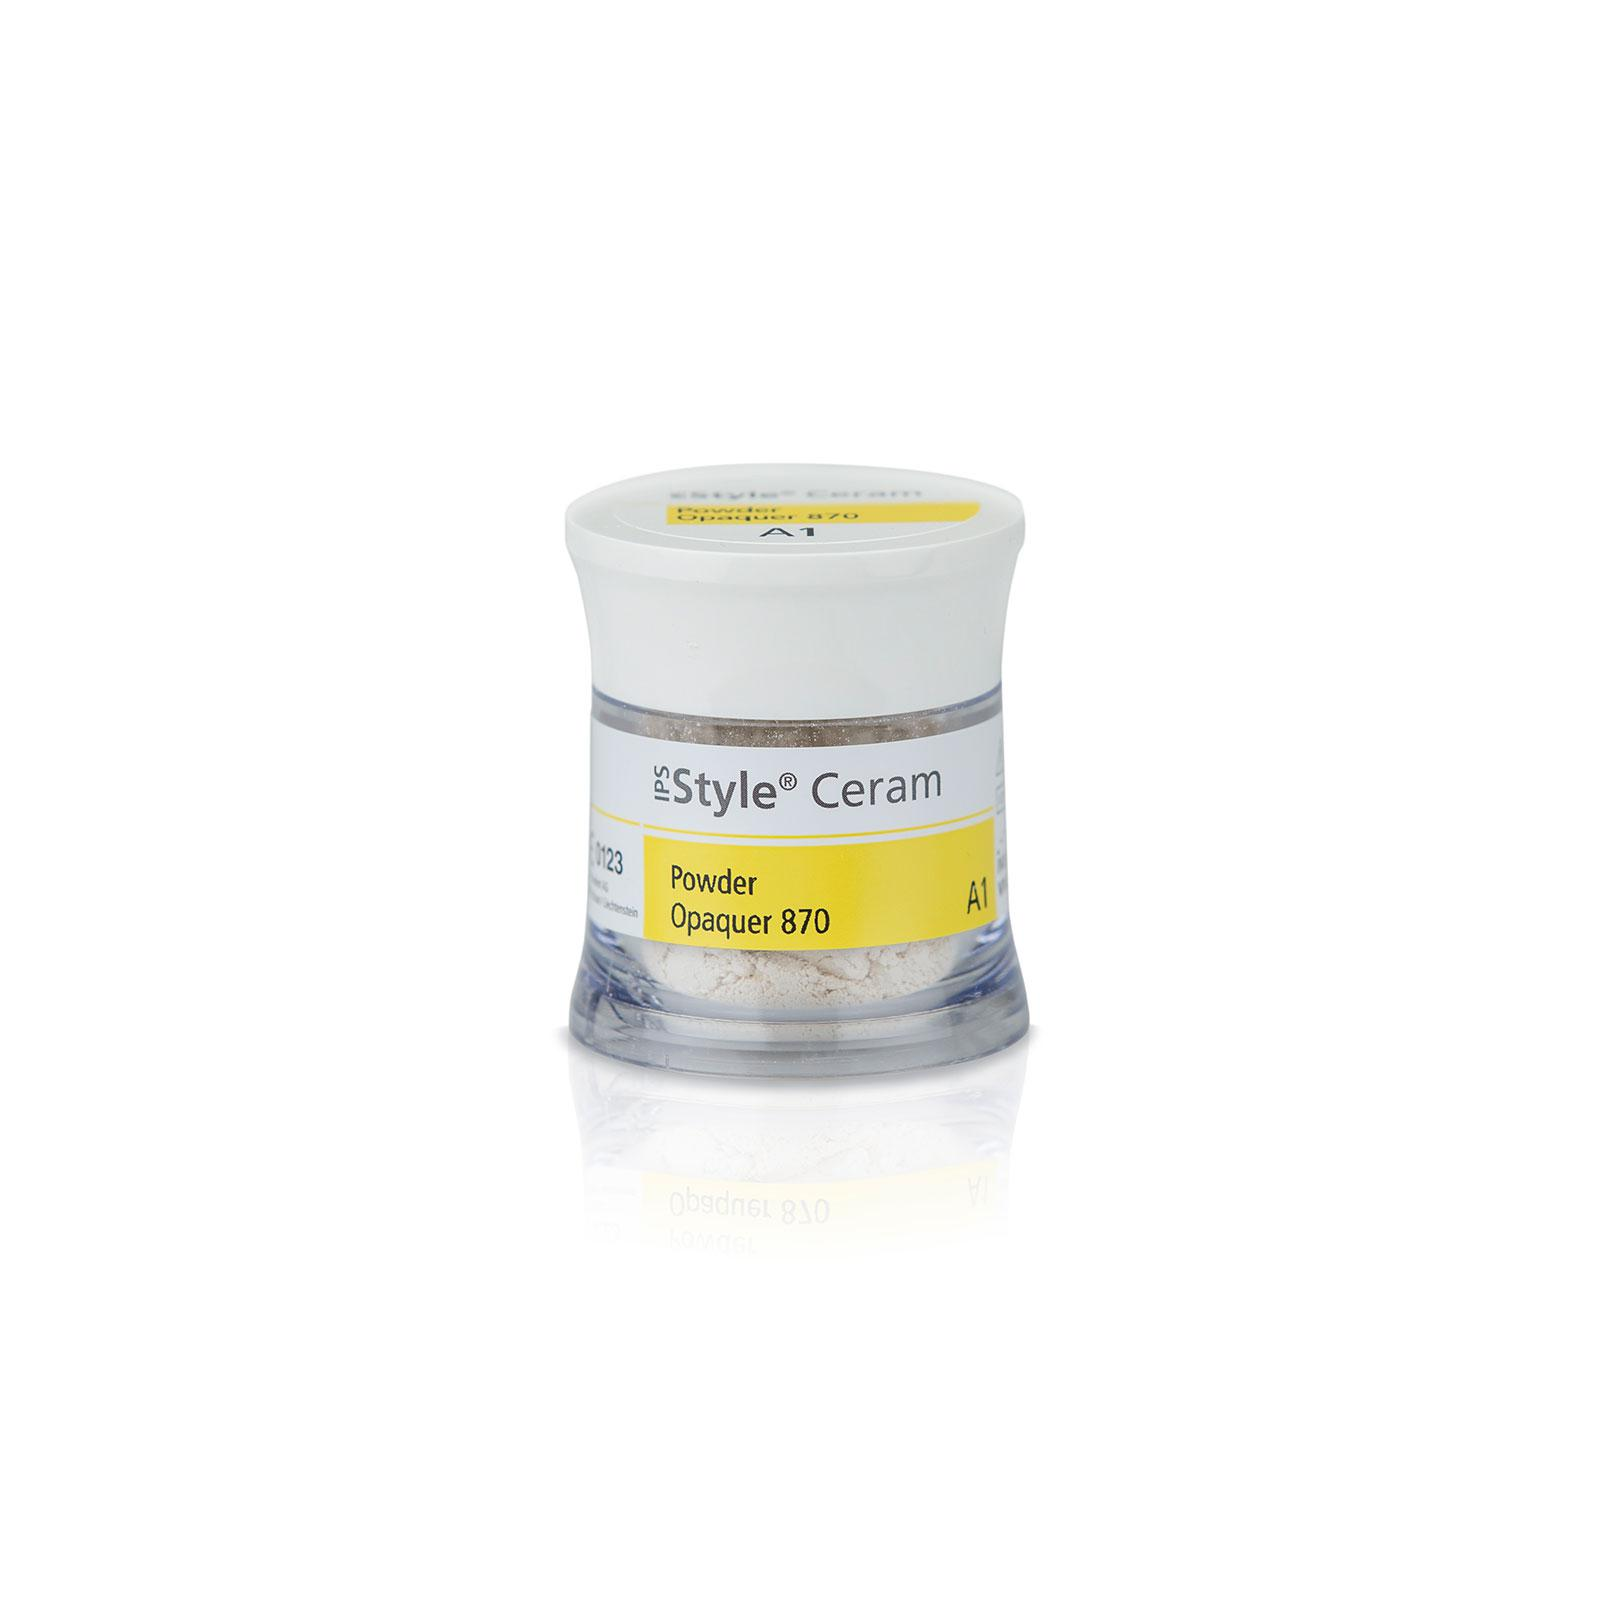 IPS Style Ceram Pow Opaquer 870 18g B3